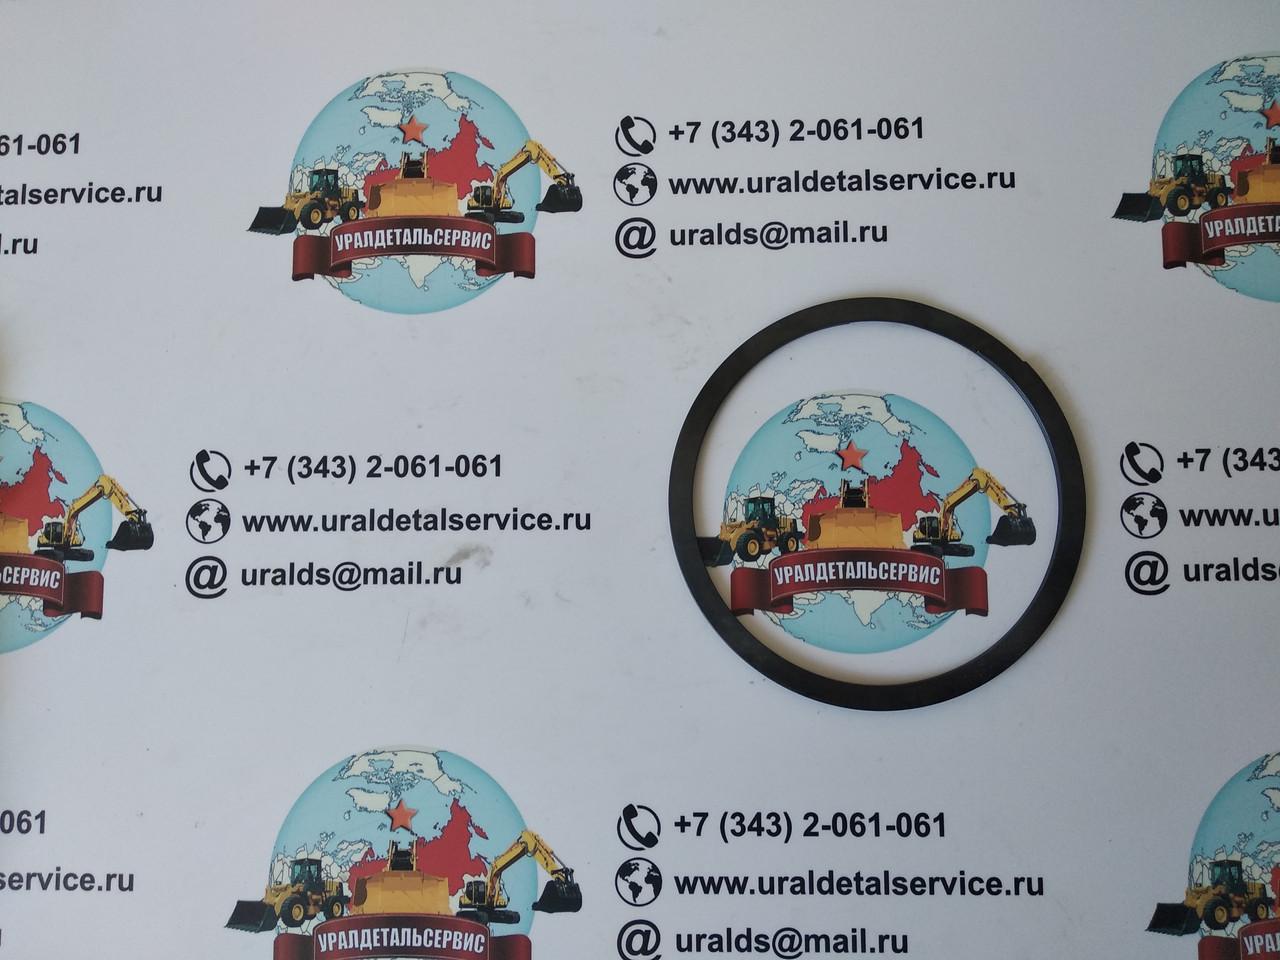 Koltso-stalnoe-17M-50-24350-Komatsu-D275A